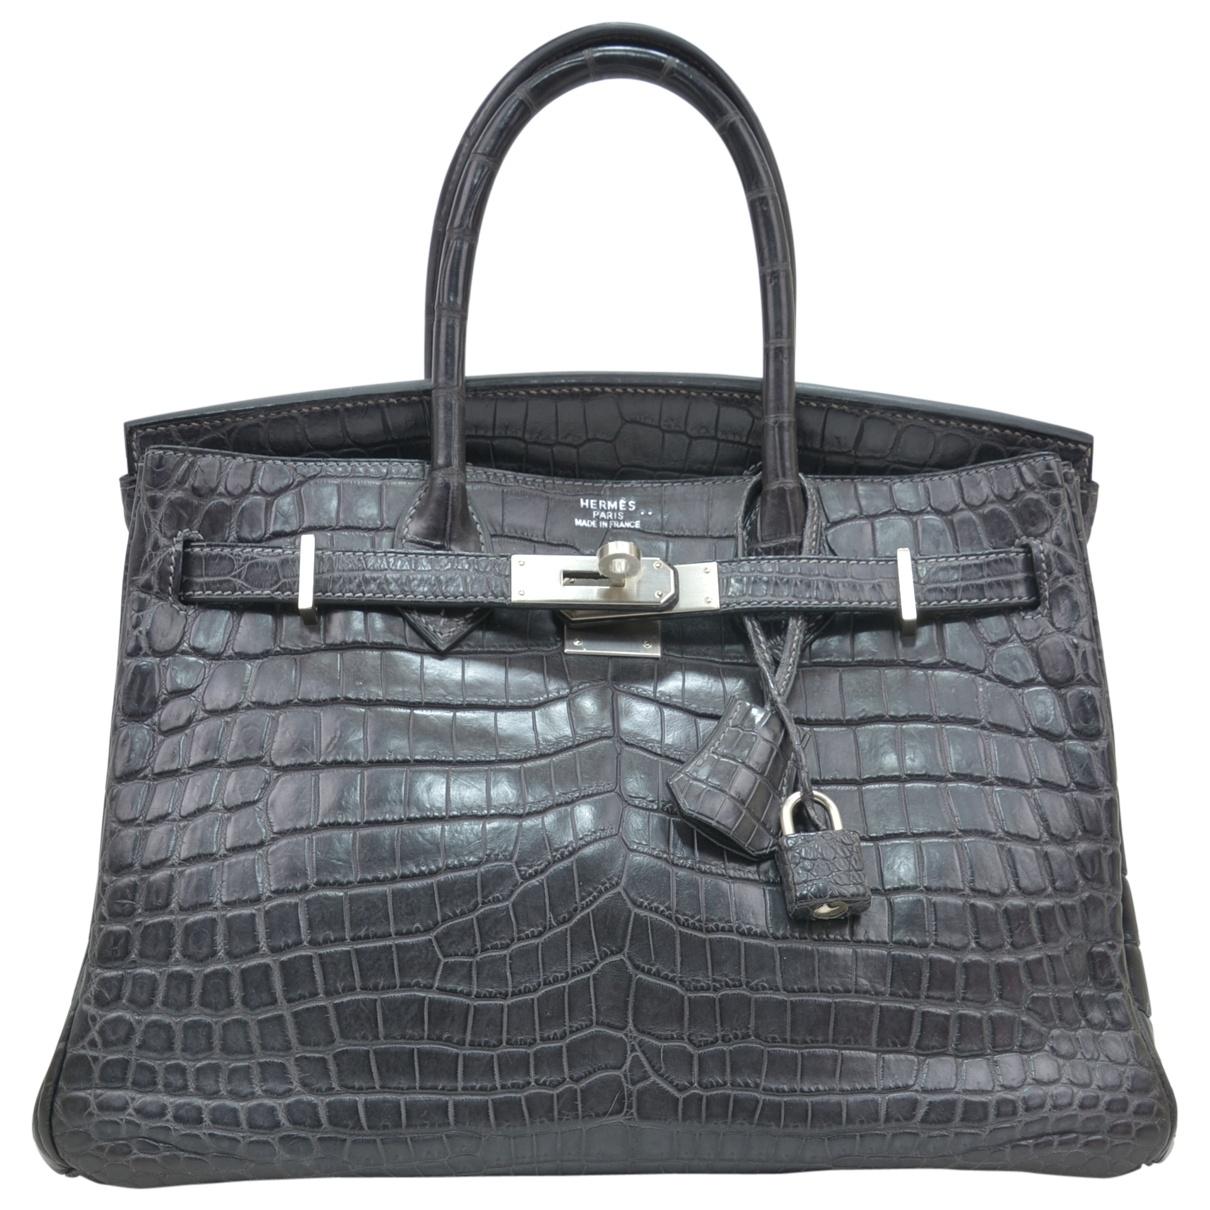 Hermes - Sac a main Birkin 30 pour femme en crocodile - anthracite